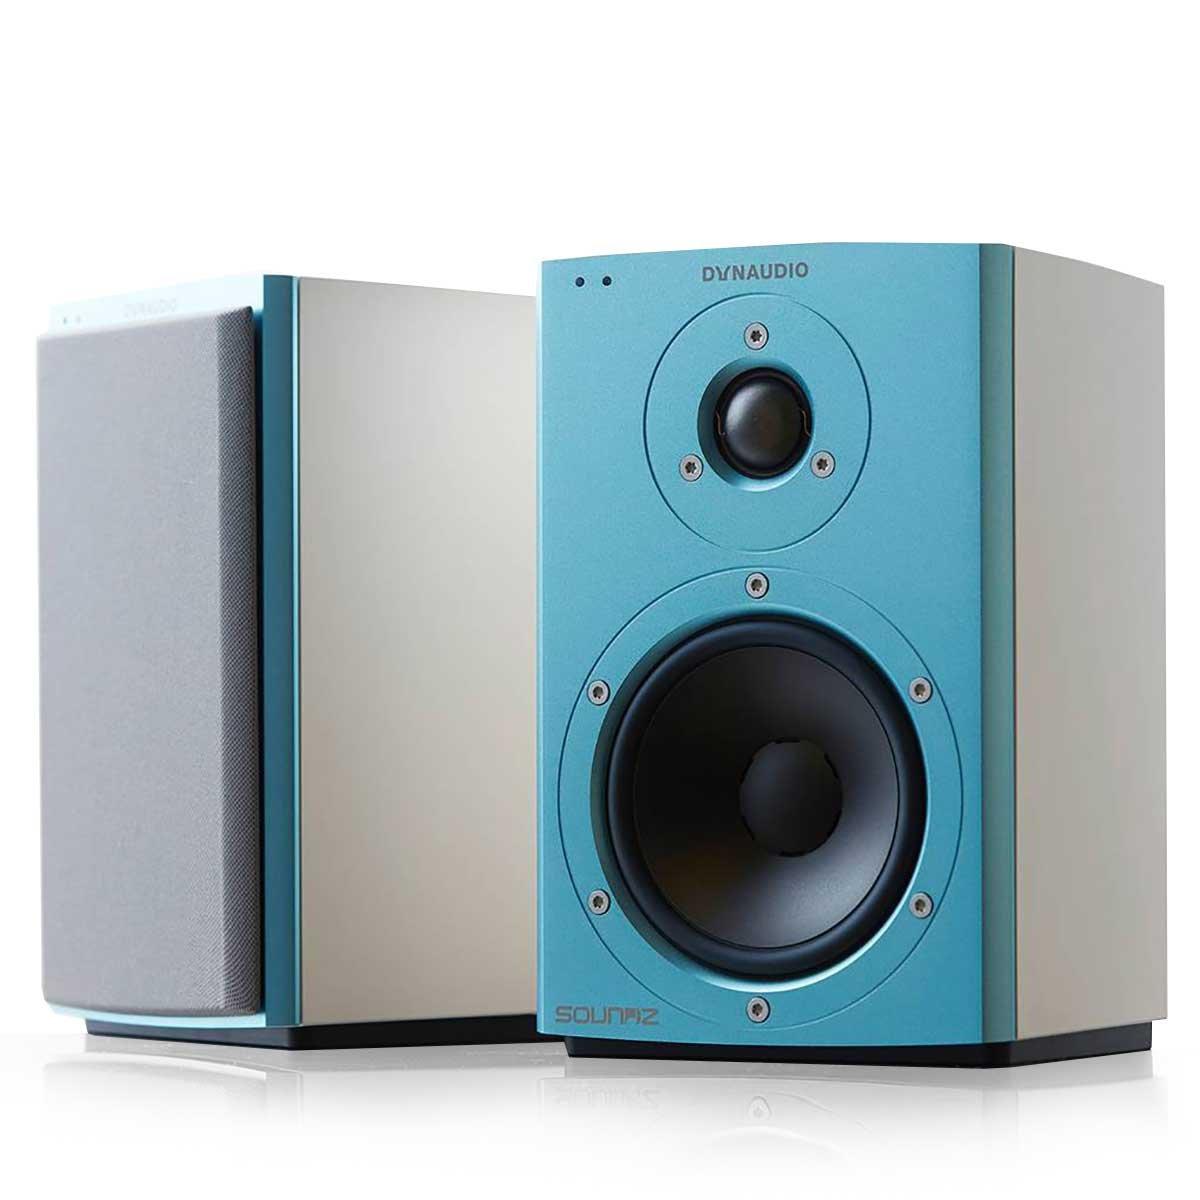 Dynaudio Xeo 2 Wireless Bookshelf Speakers, Limited Edition - Pair (Blue/White)